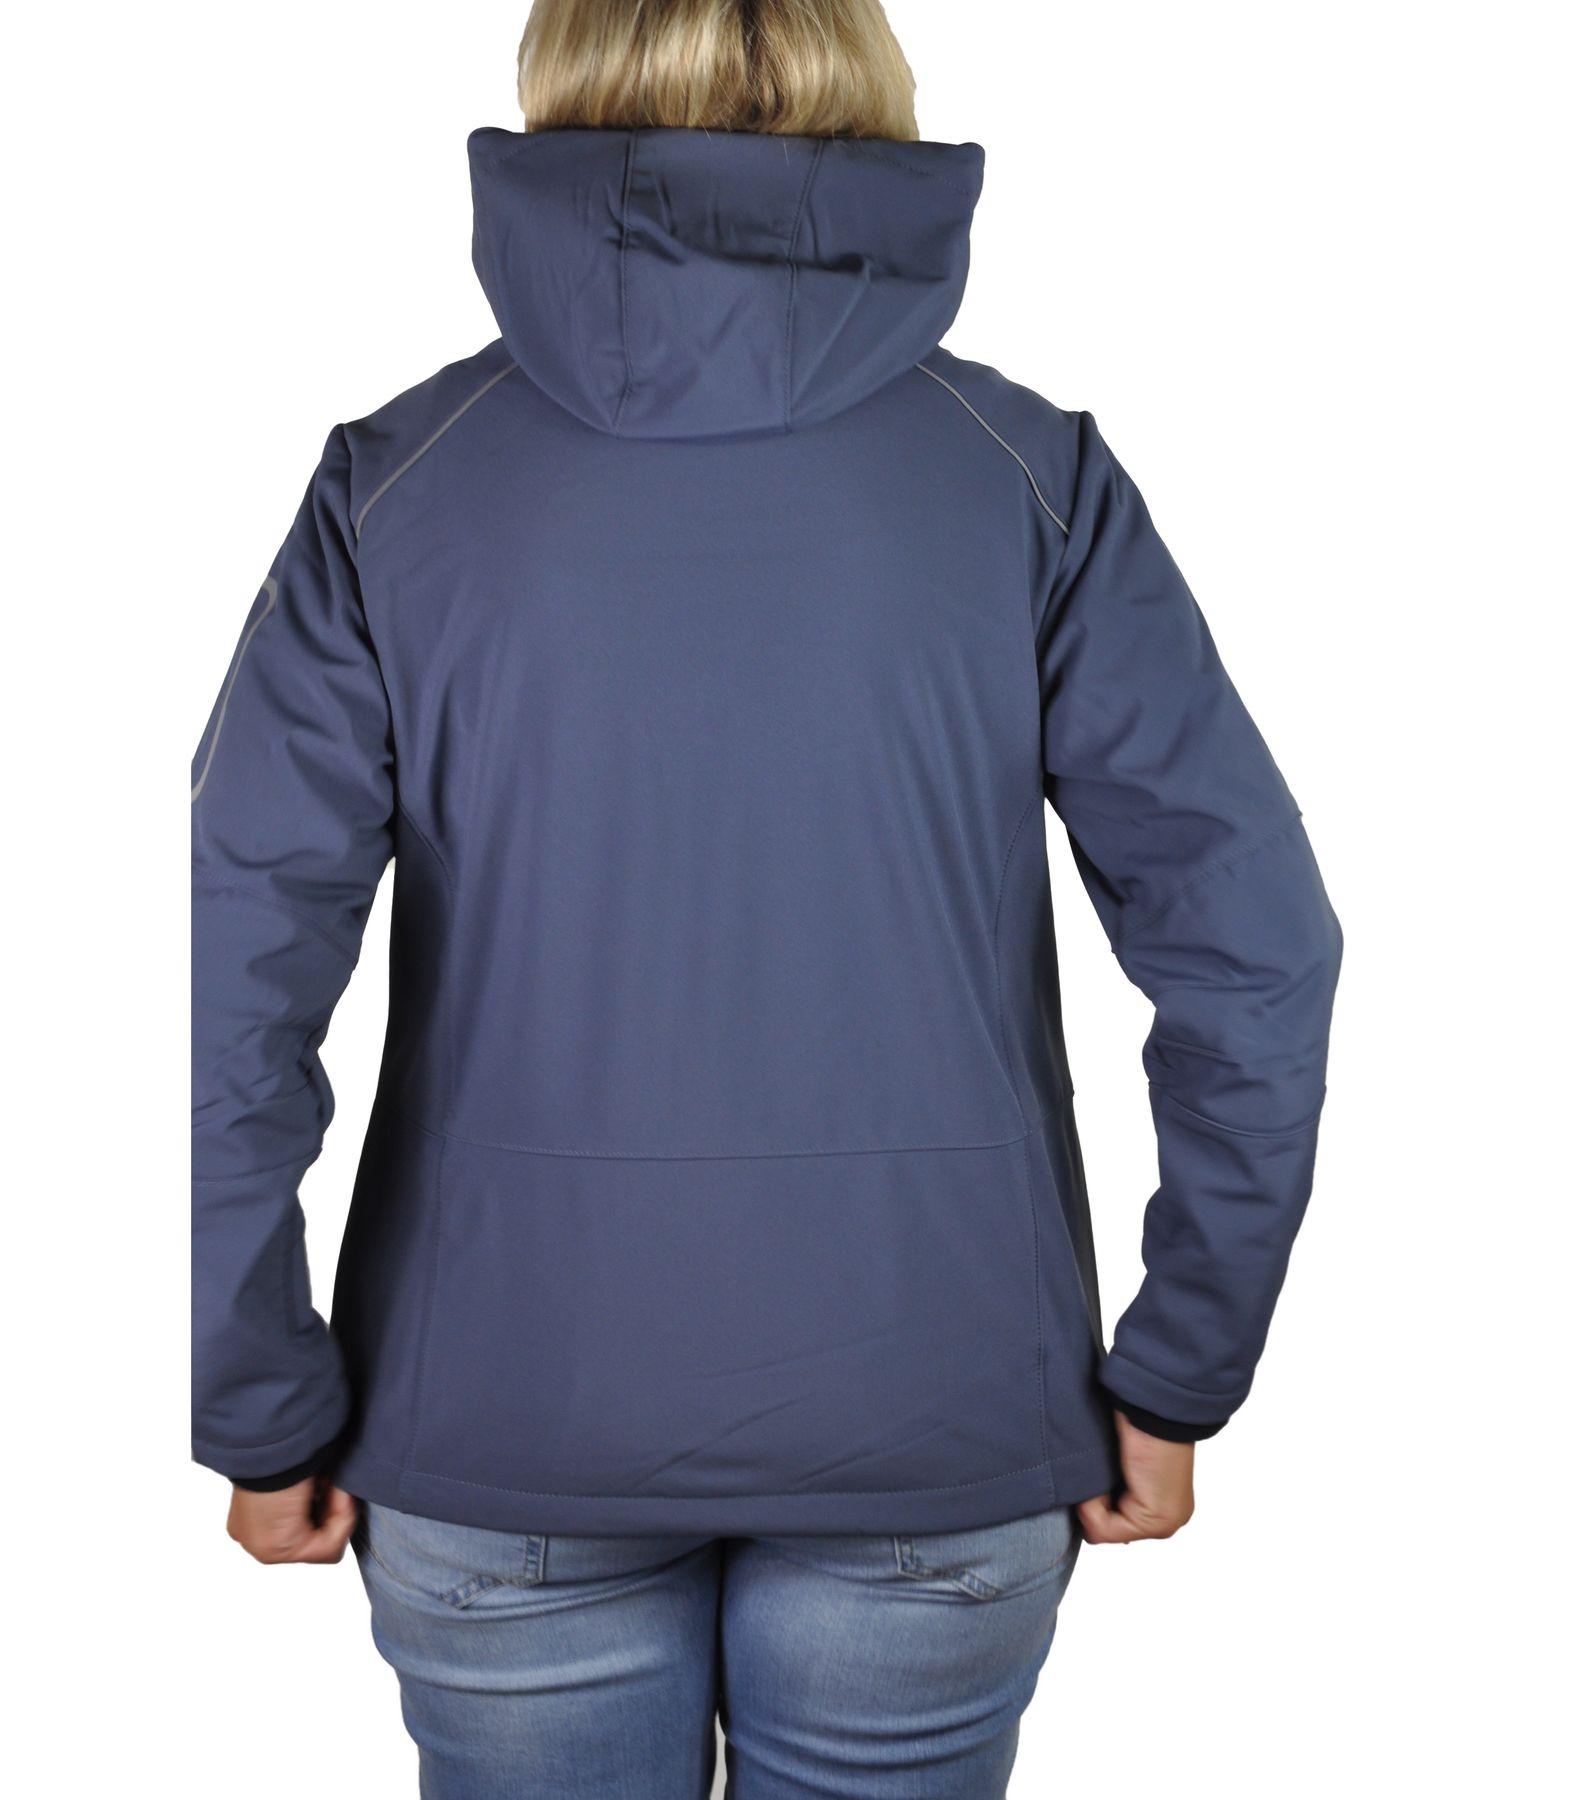 CMP - Damen Softshell Jacke, Winddicht, Wasserdicht, Atmungsaktiv (3A05396) – Bild 10